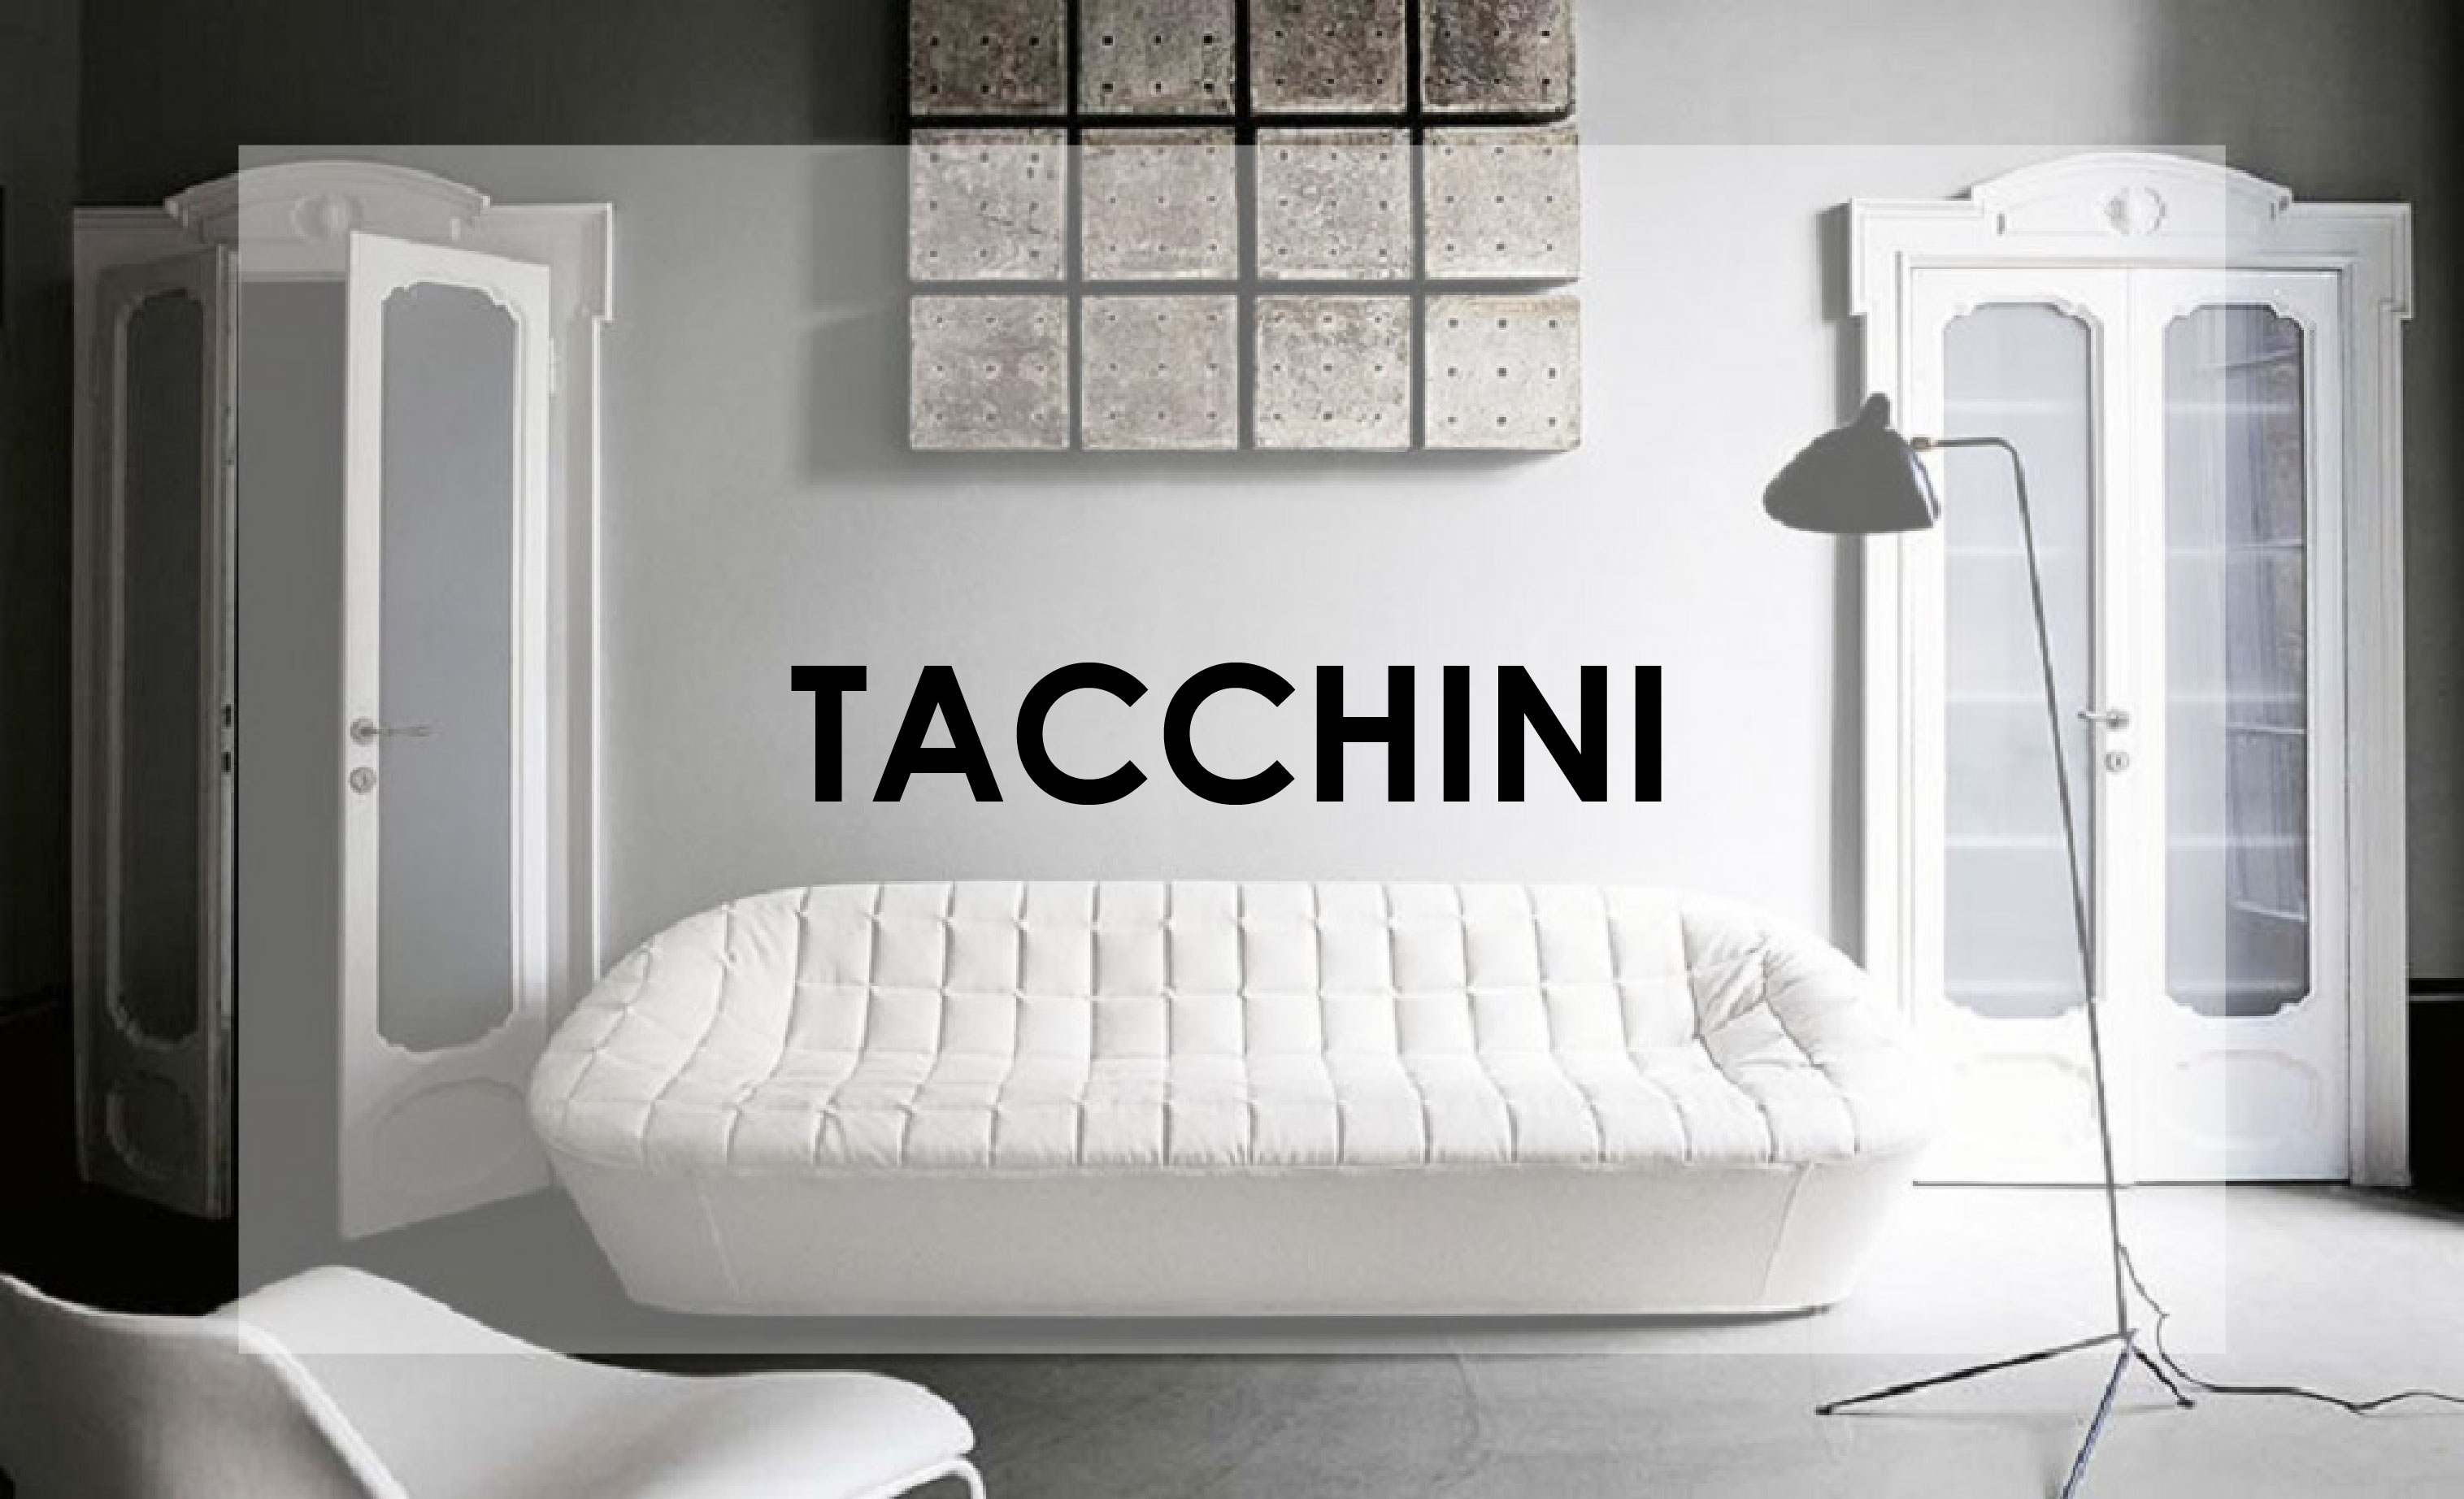 chill out sofa chillout sofa airsofa chillout bag hangout bag buddy inflatable air sofa lamzac. Black Bedroom Furniture Sets. Home Design Ideas